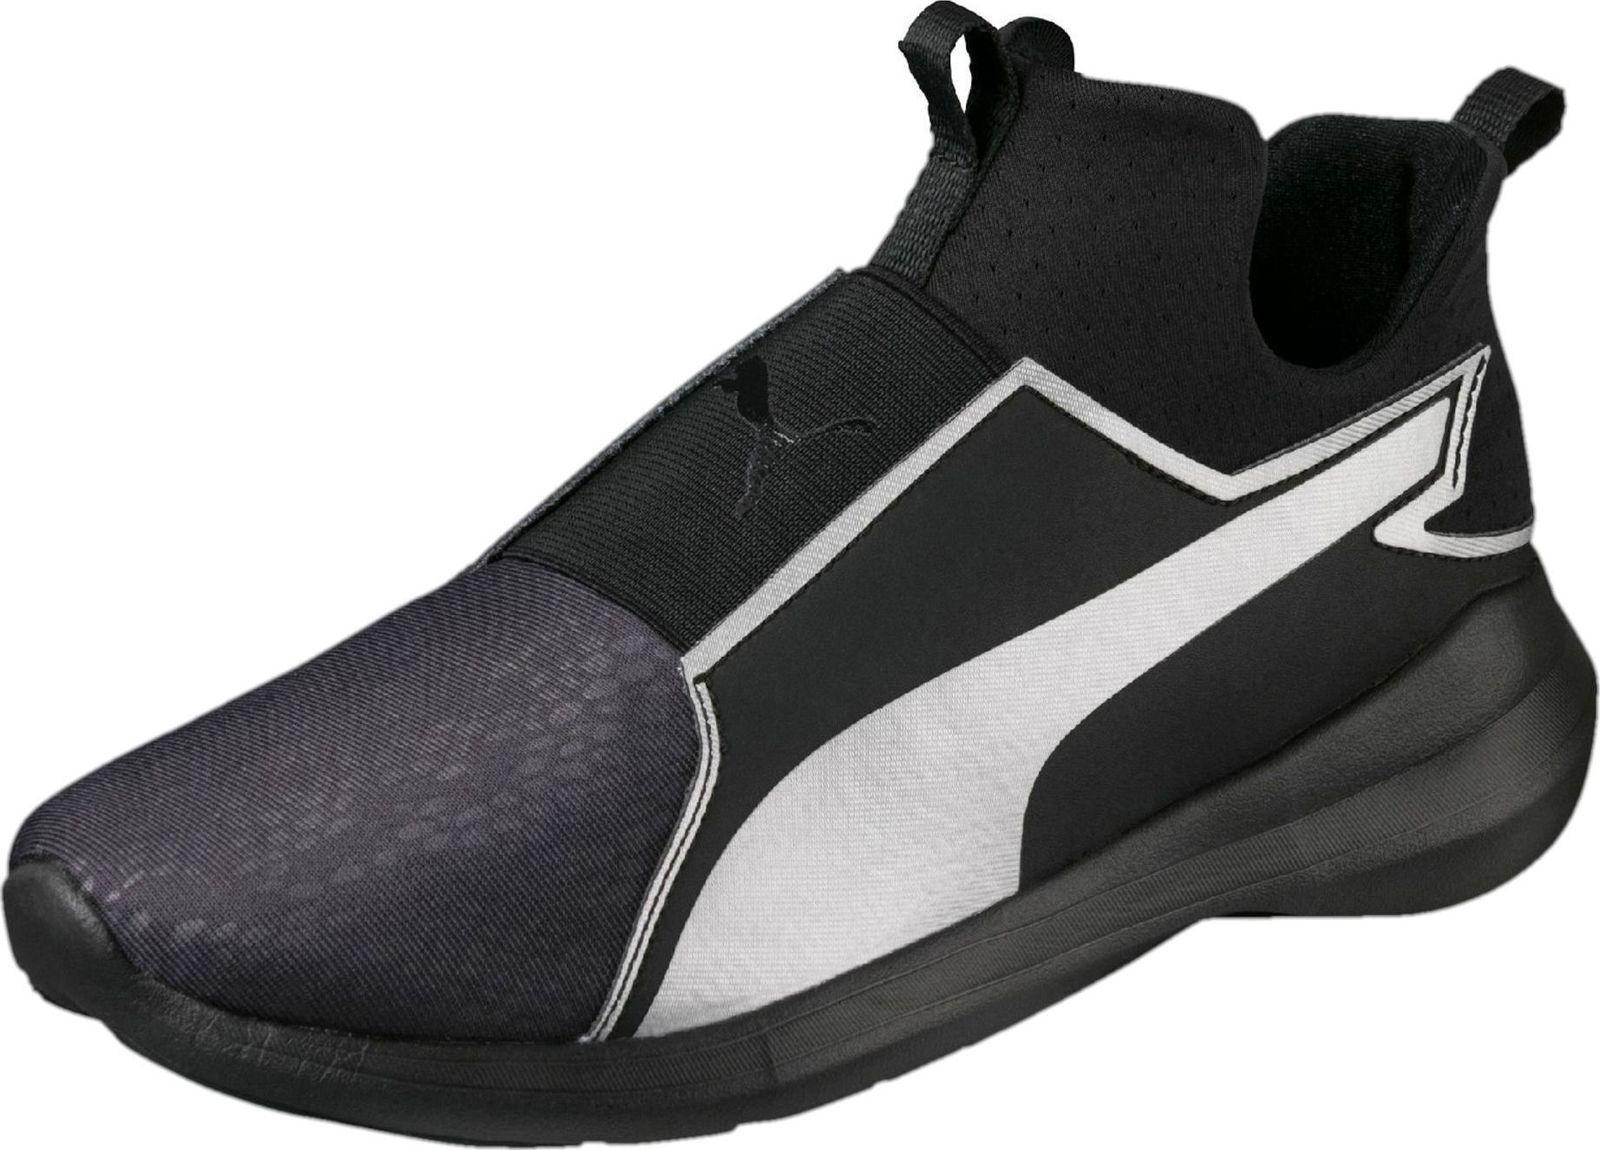 NEU PUMA REBEL MID WOMEN'S SUMMER TRAINERS RUNNING Schuhe BLACK SILVER 364580 01